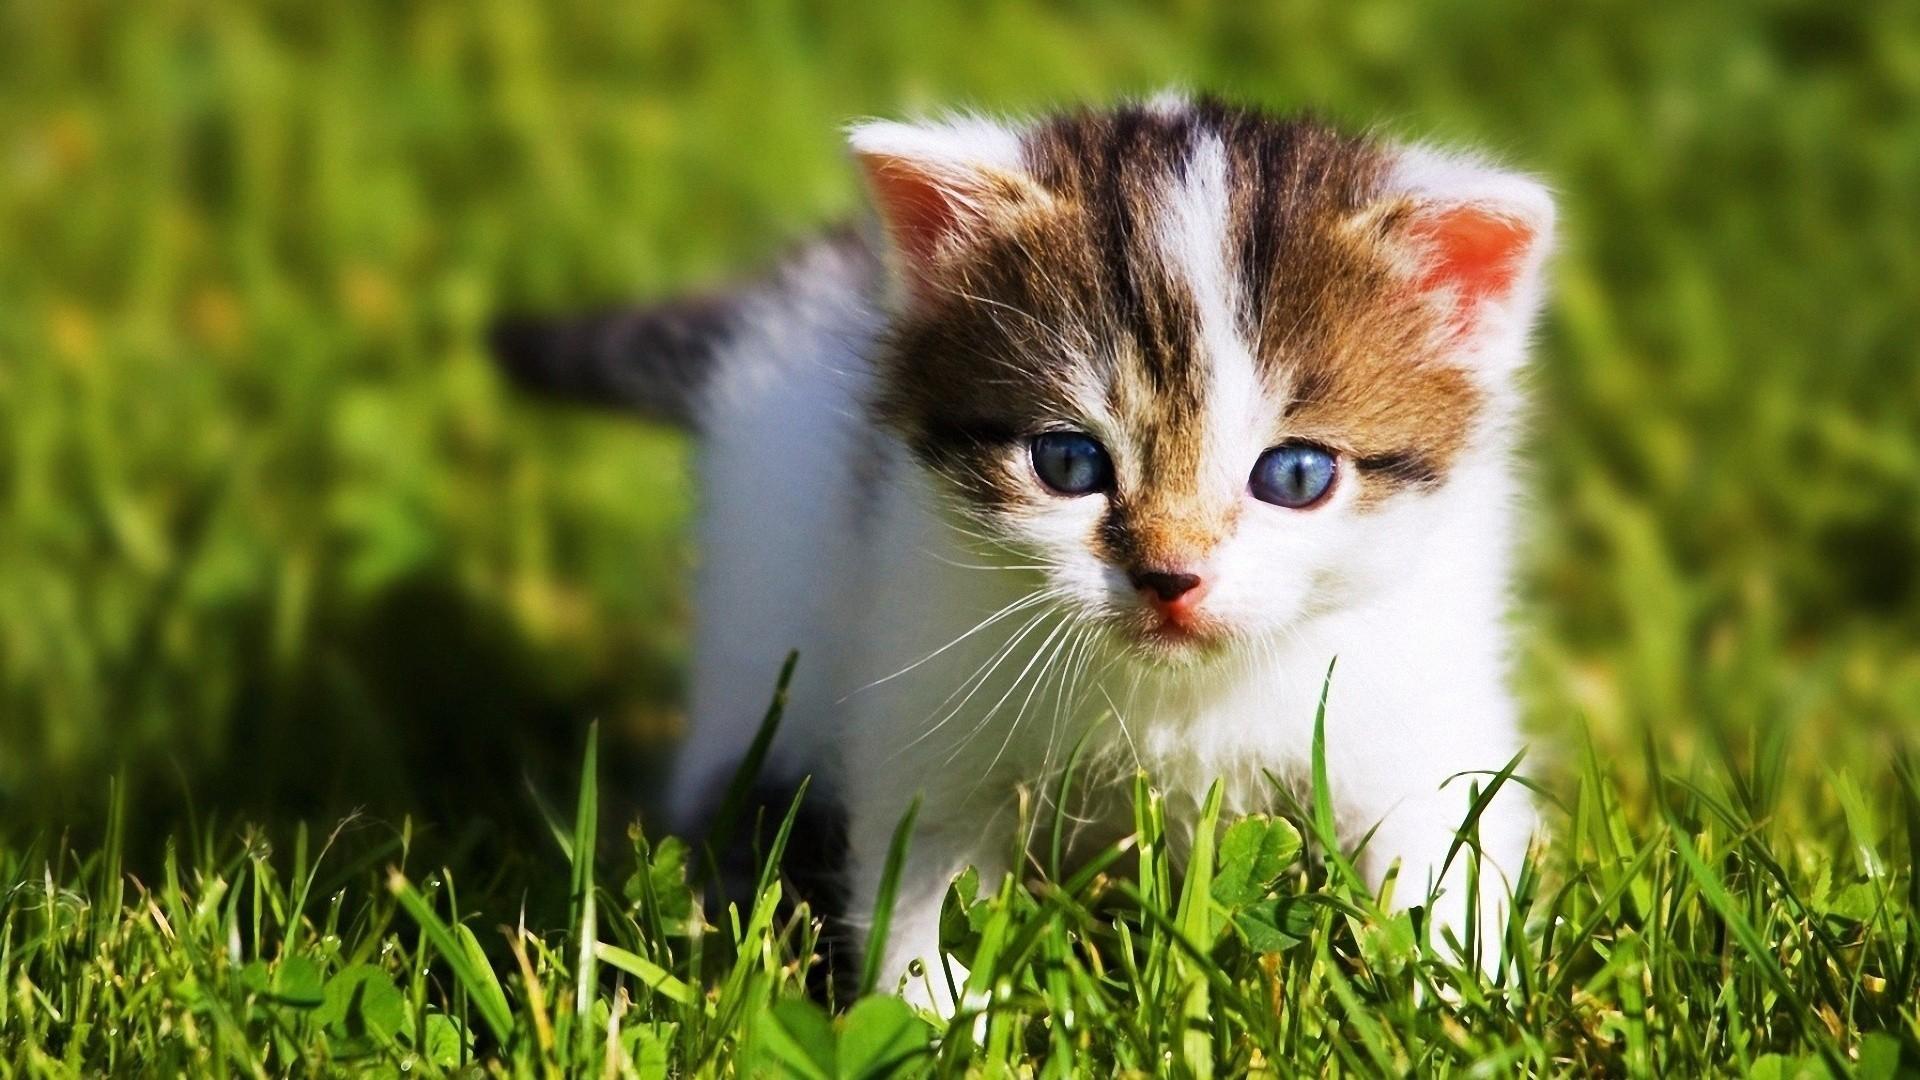 Res: 1920x1080, Animals baby kittens wallpaper